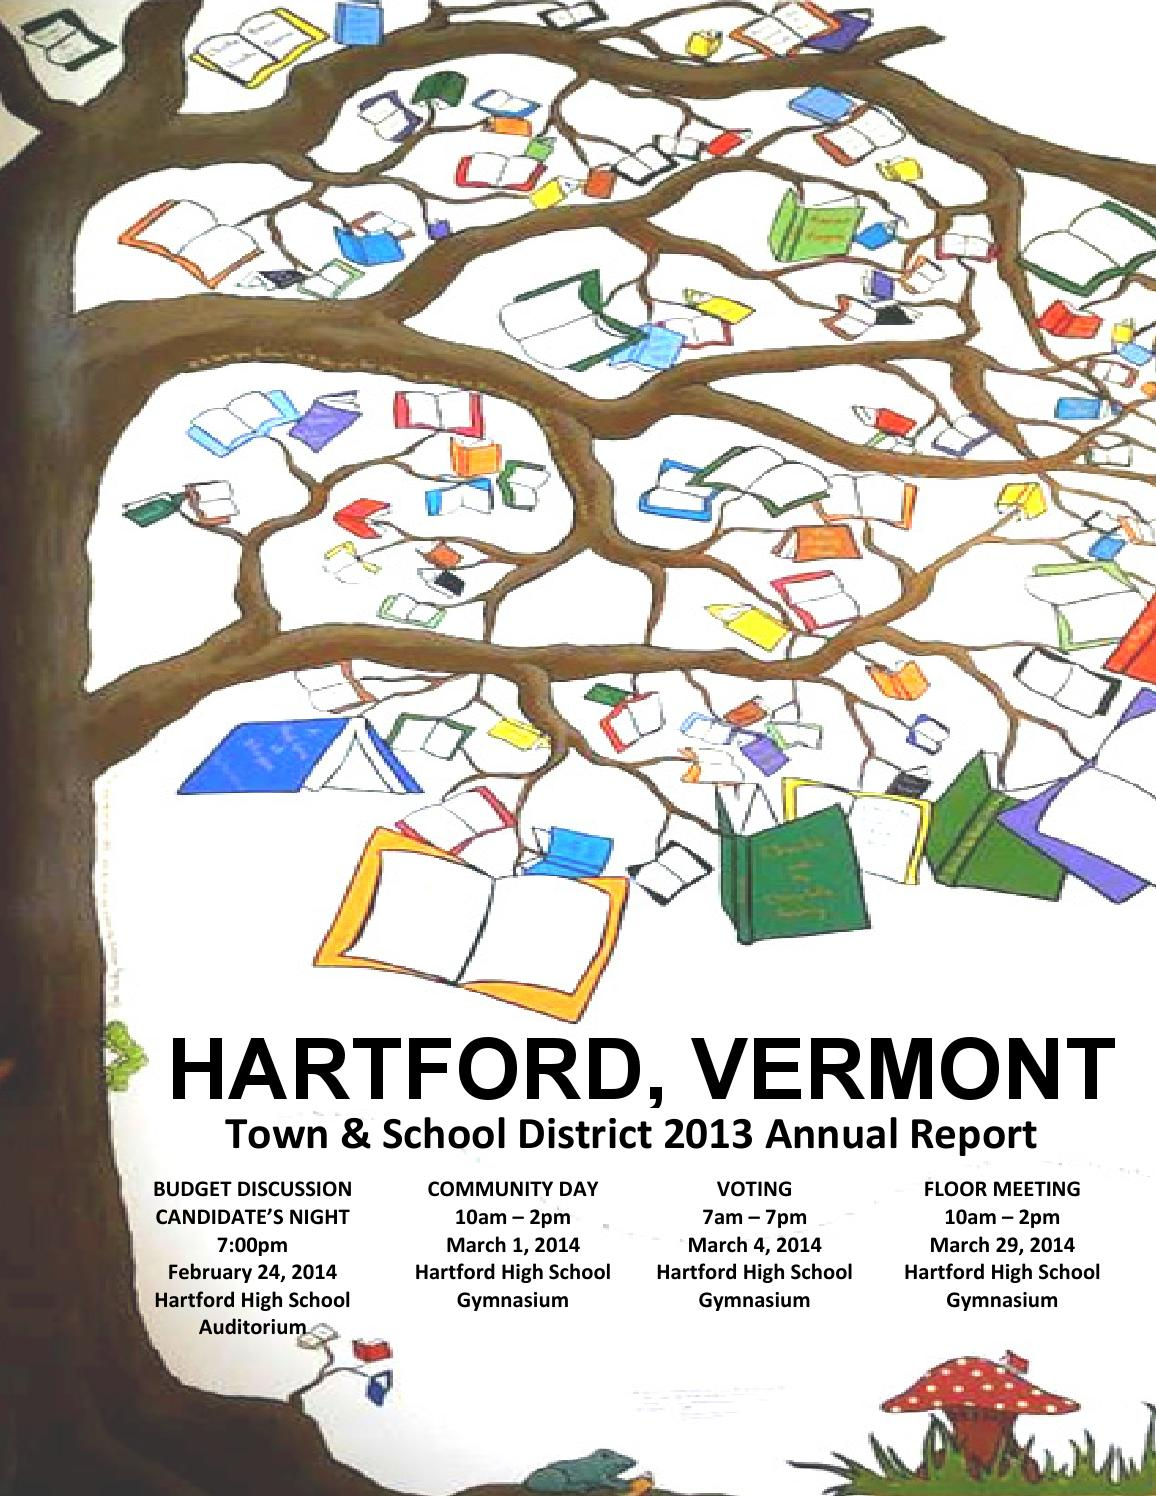 Town School Annual Report 2013 By Of Hartford Vt Issuu Purpose Electric Motor 1 3 Hp Model 10000600 Motors